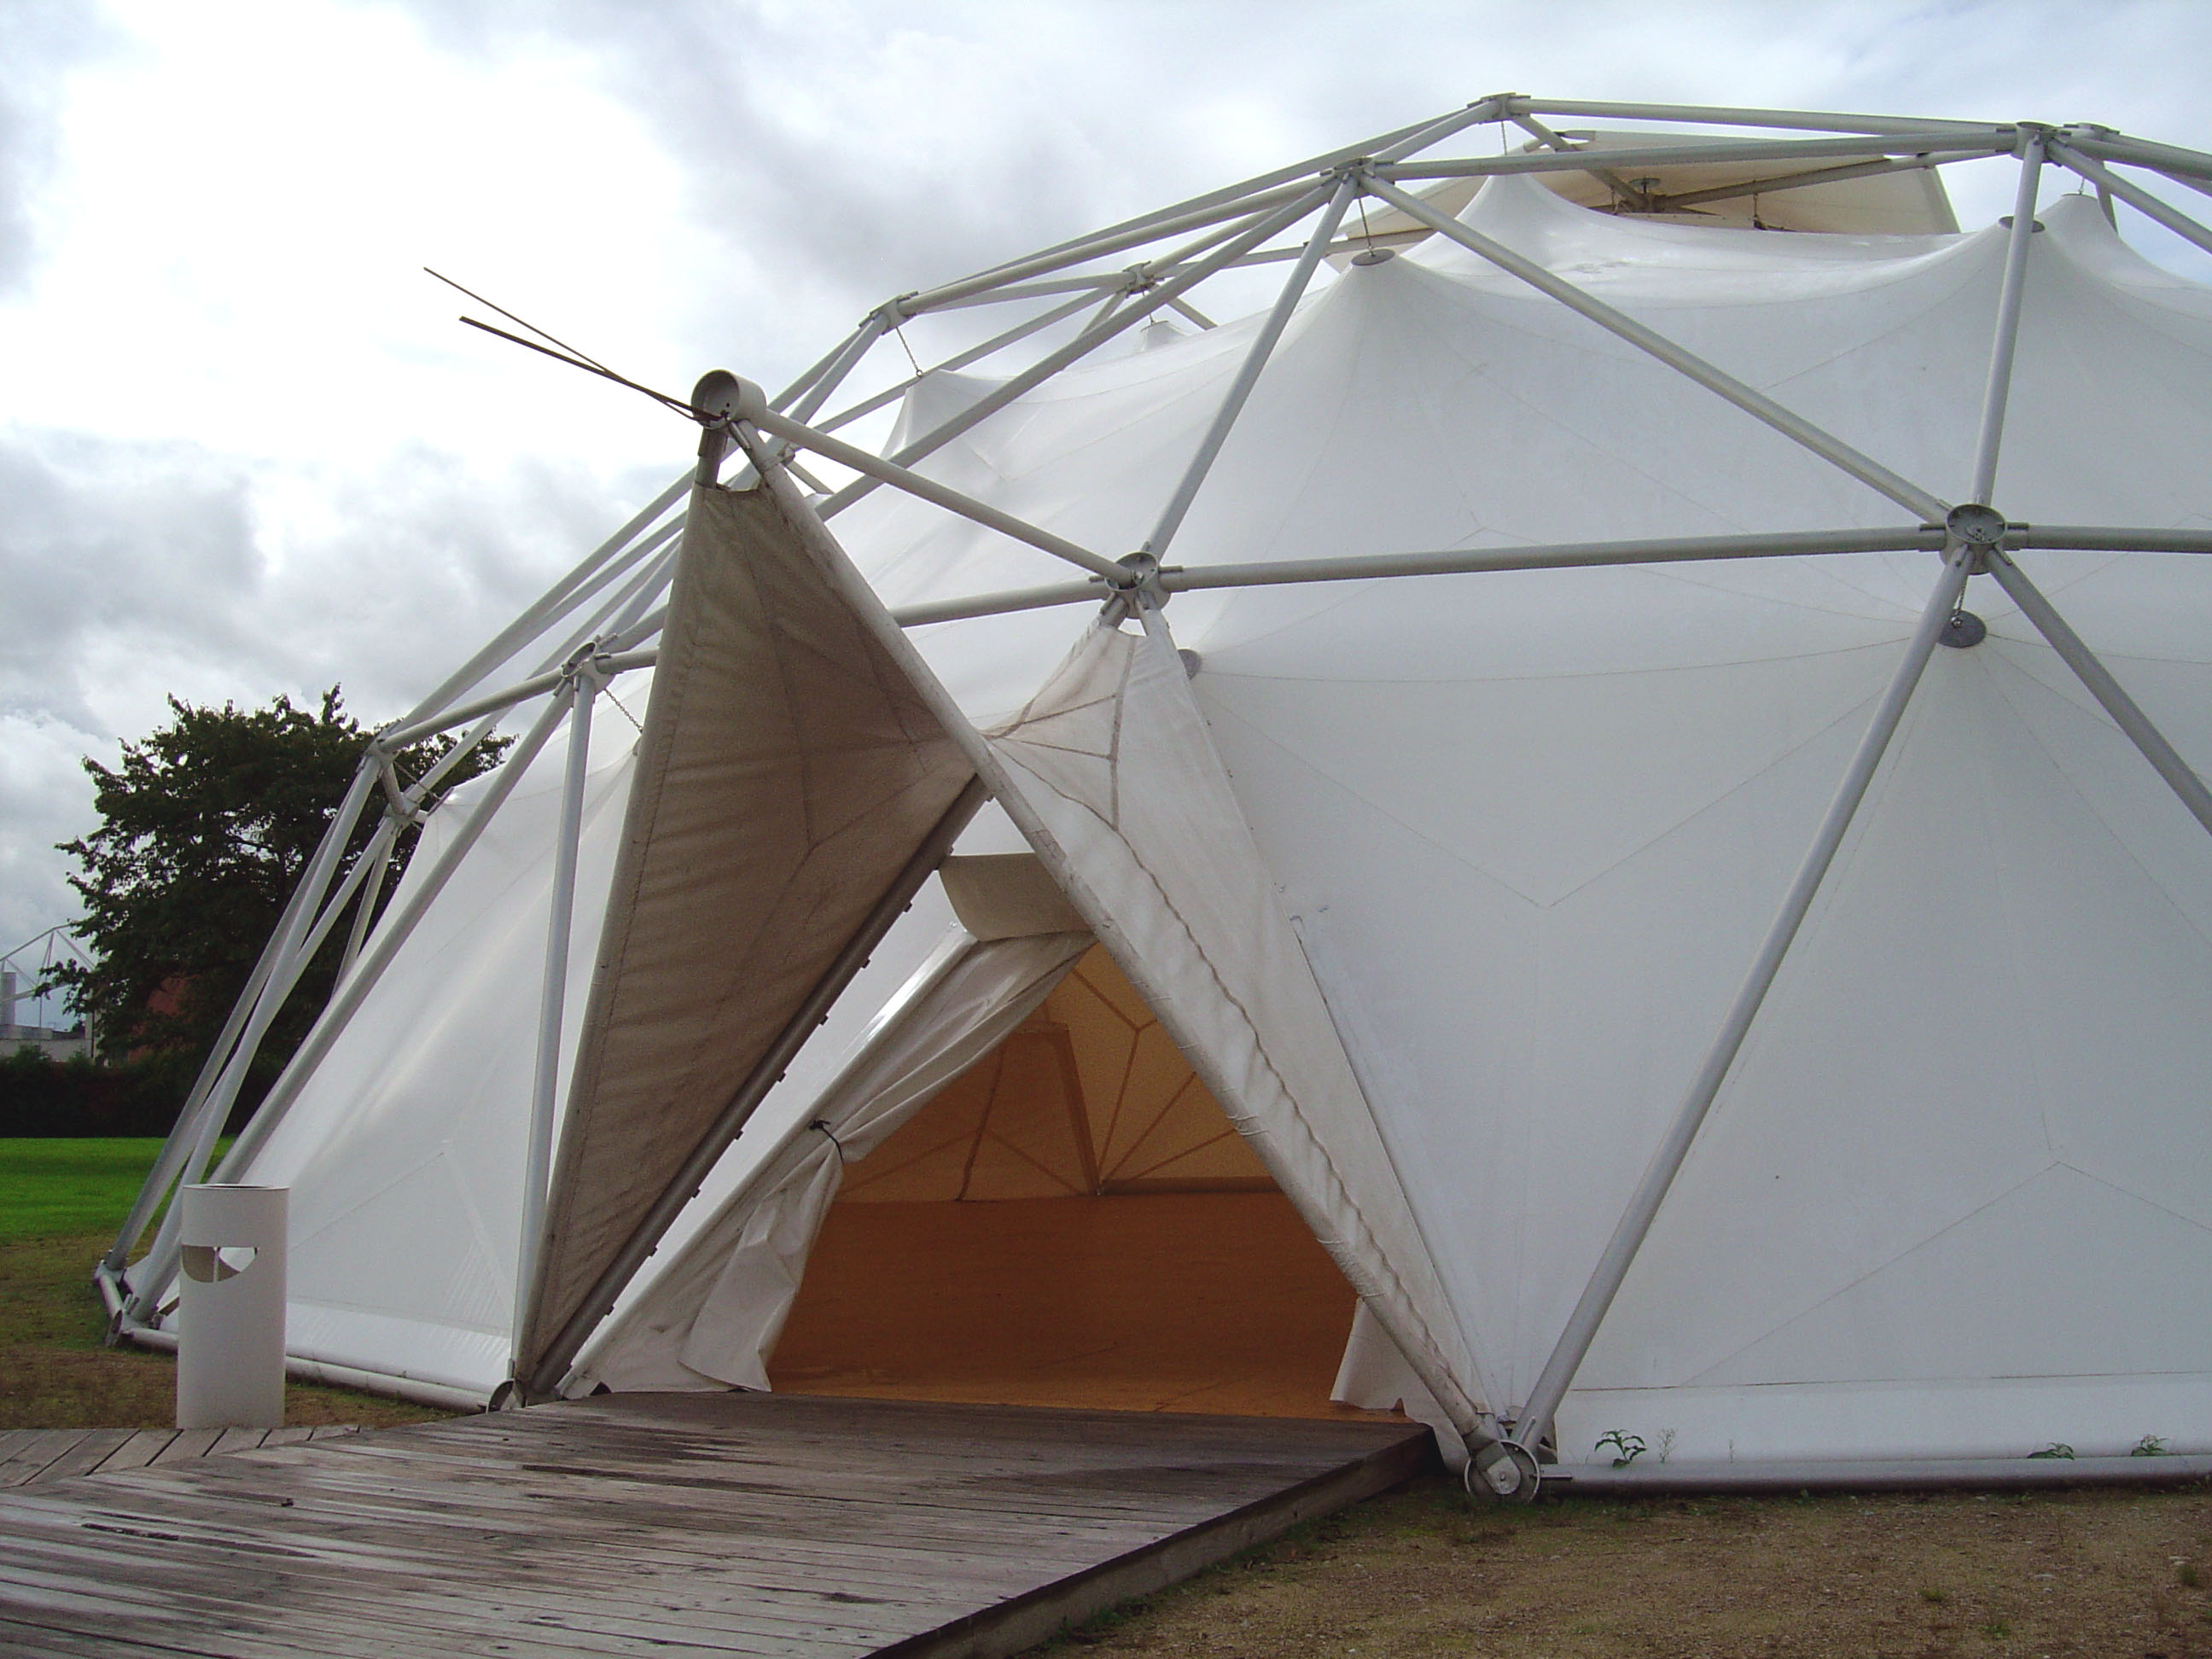 FileVitra geodesic dome.jpg & File:Vitra geodesic dome.jpg - Wikimedia Commons